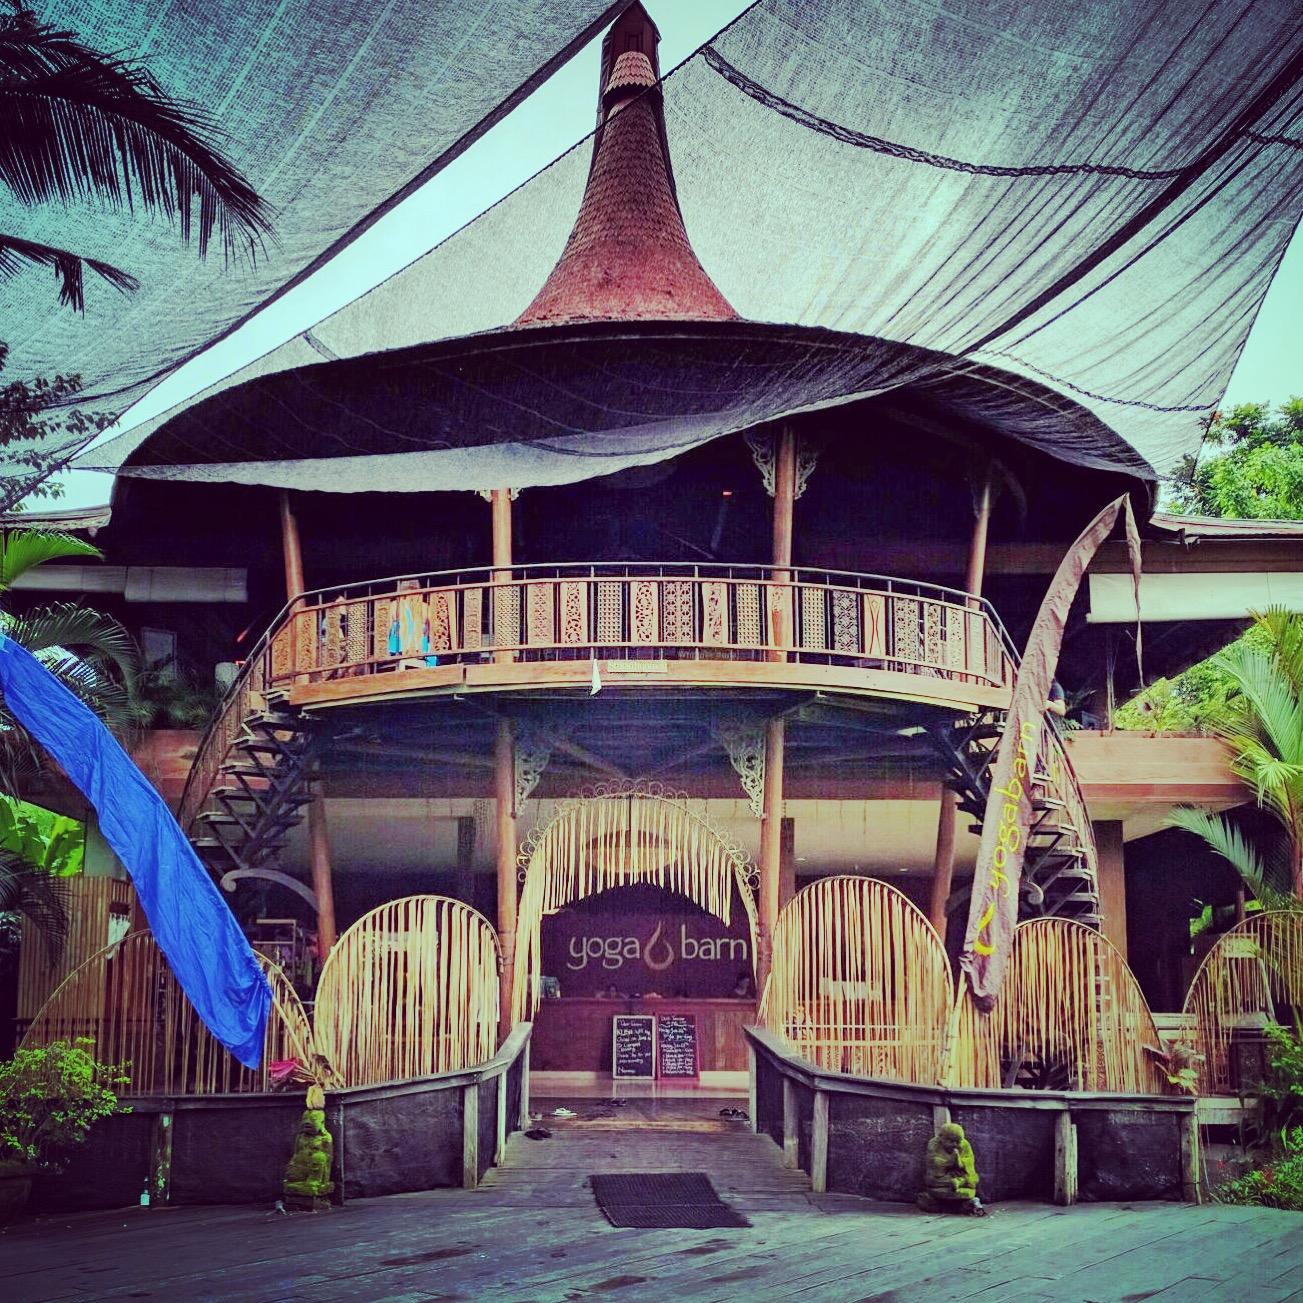 5. The Yoga Barn -